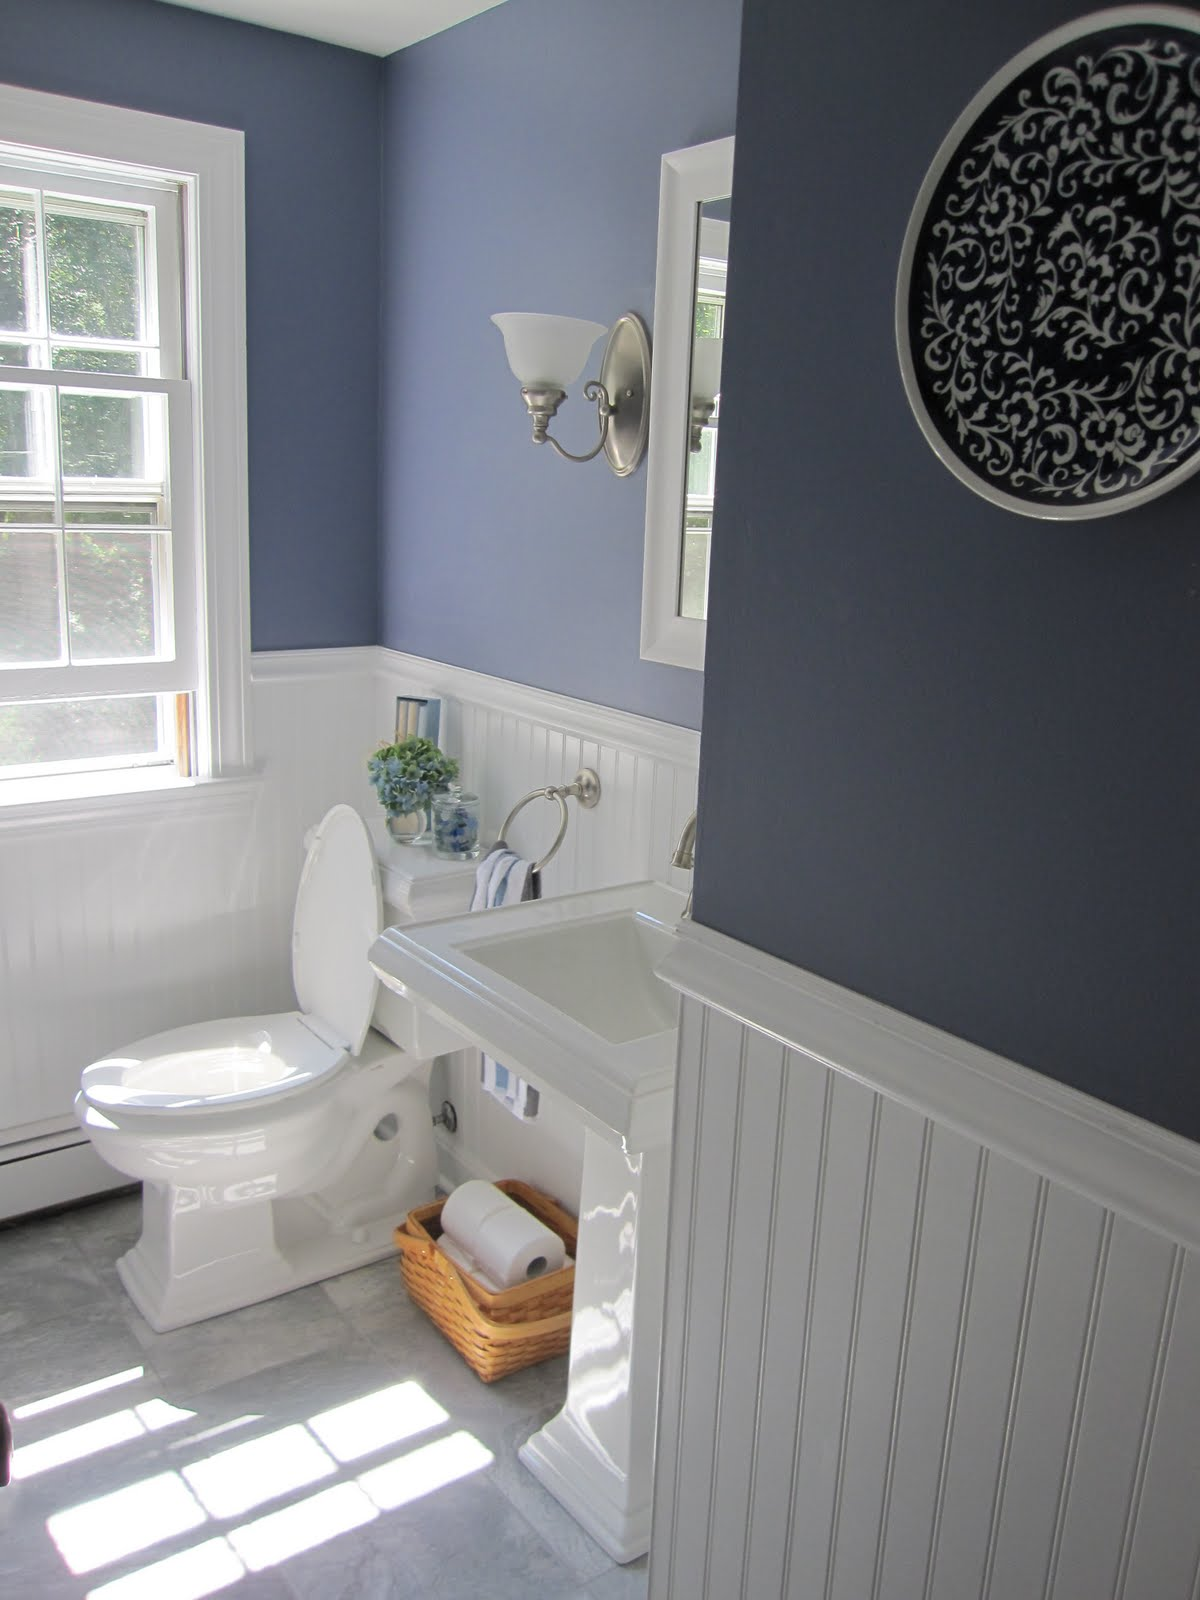 Ремонт туалета панелями акриловыми